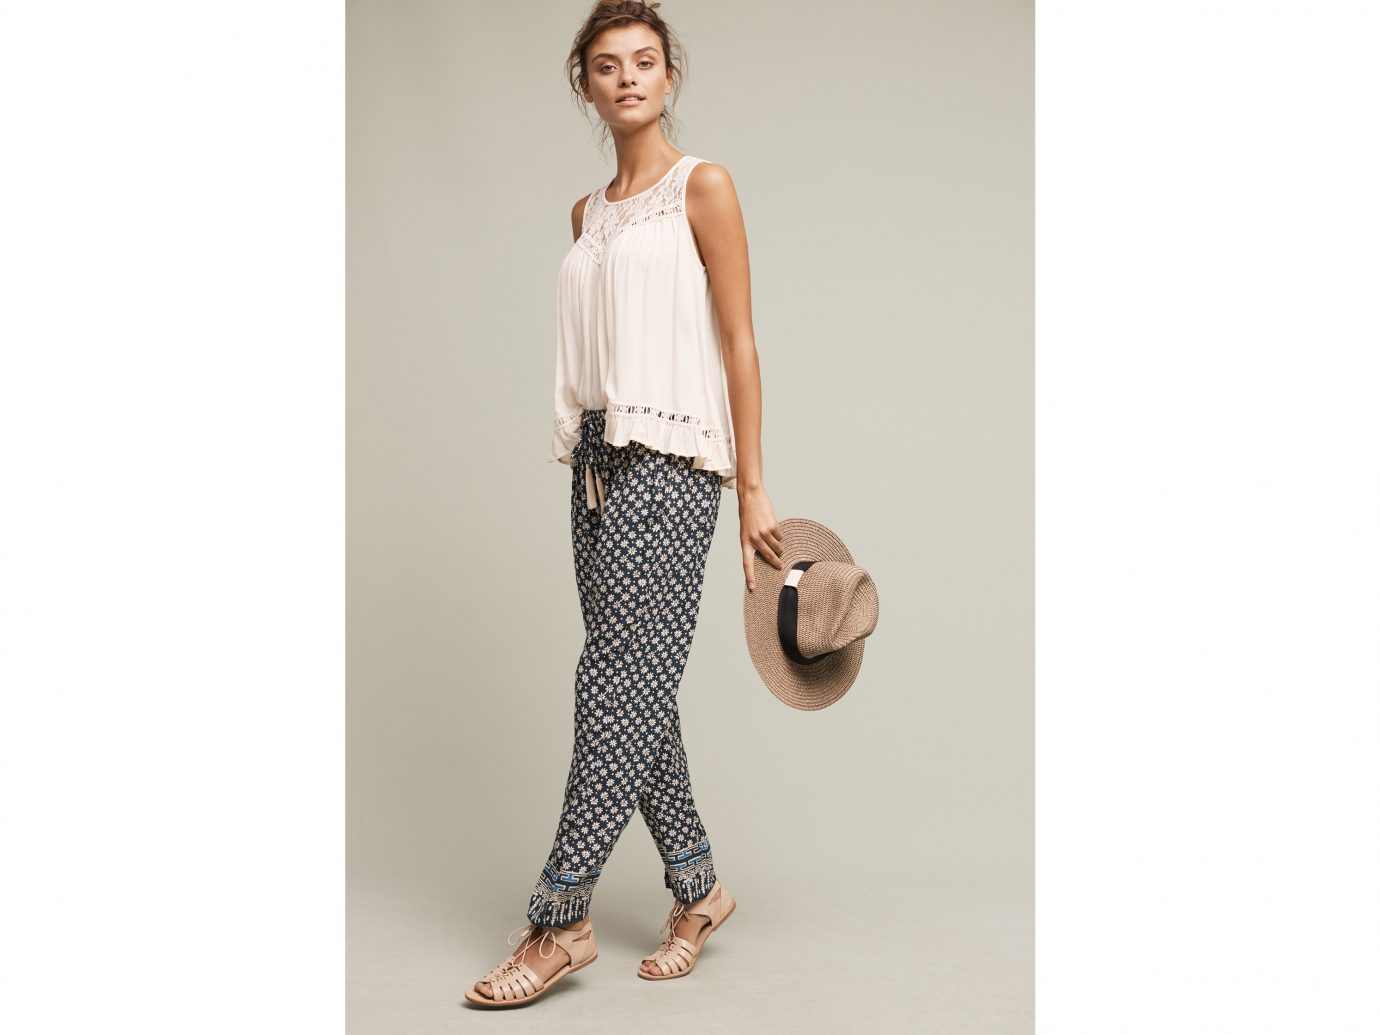 Style + Design clothing posing person sleeve standing pattern dress spring polka dot Design t shirt fashion trousers jeans abdomen photo shoot textile neck blouse